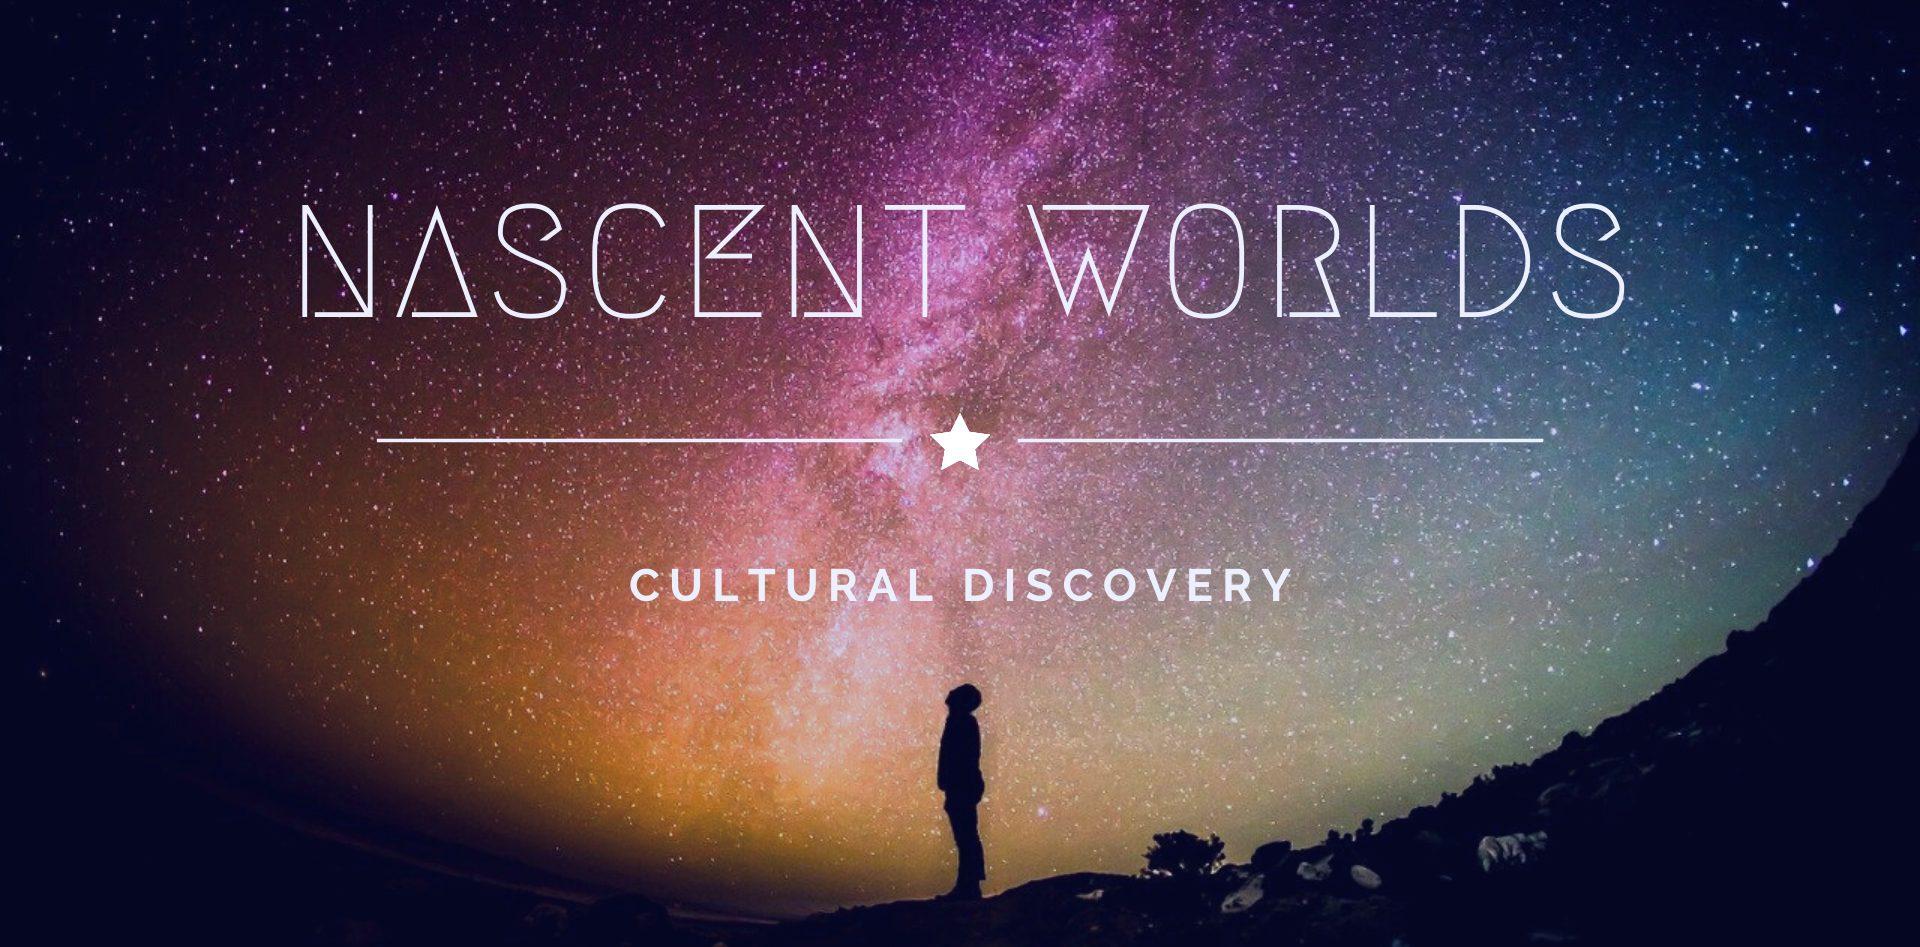 Nascent worlds promo banner